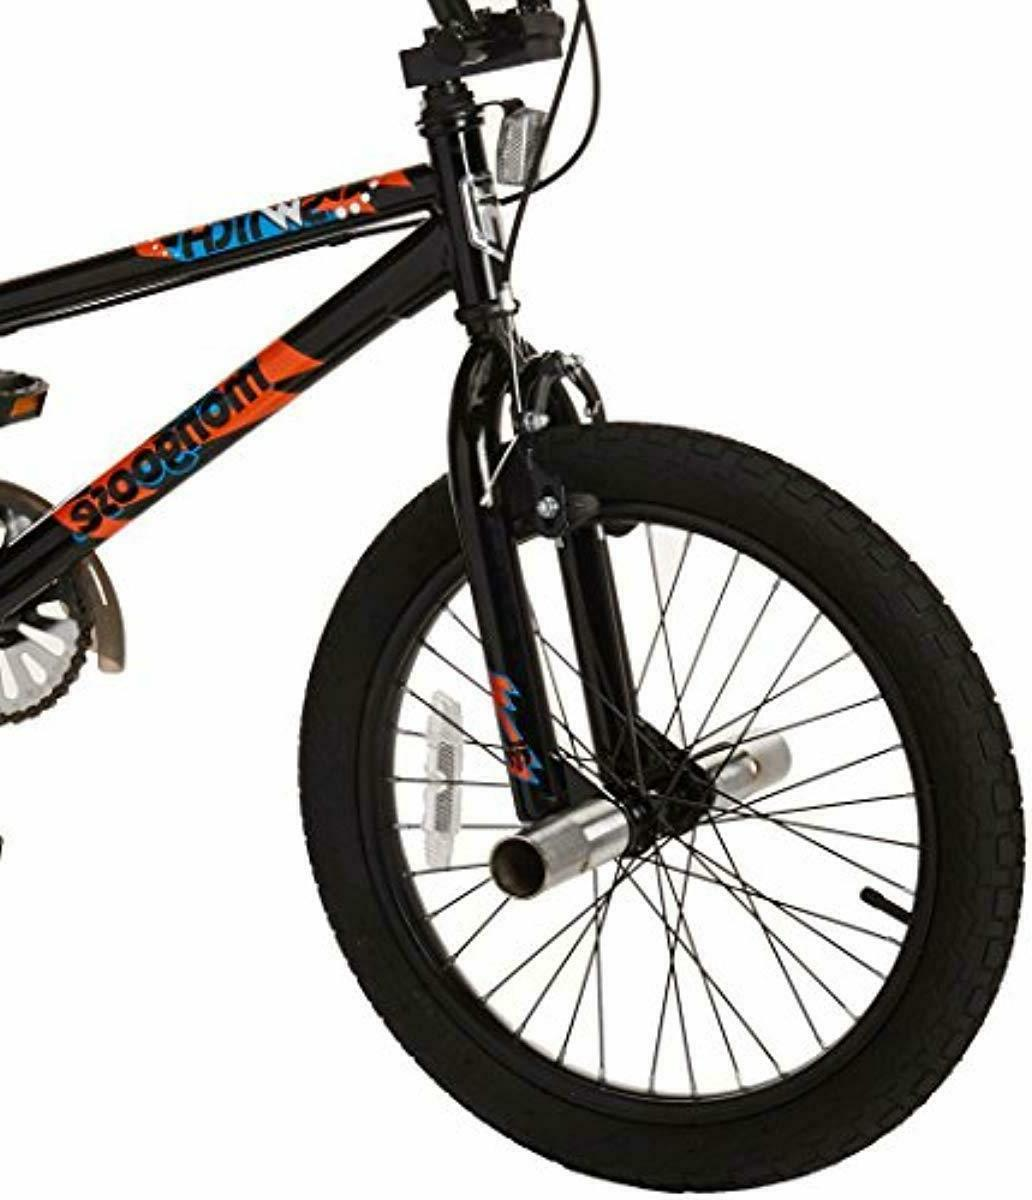 Mongoose BMX Bike with Training Wheels, 18-Inch